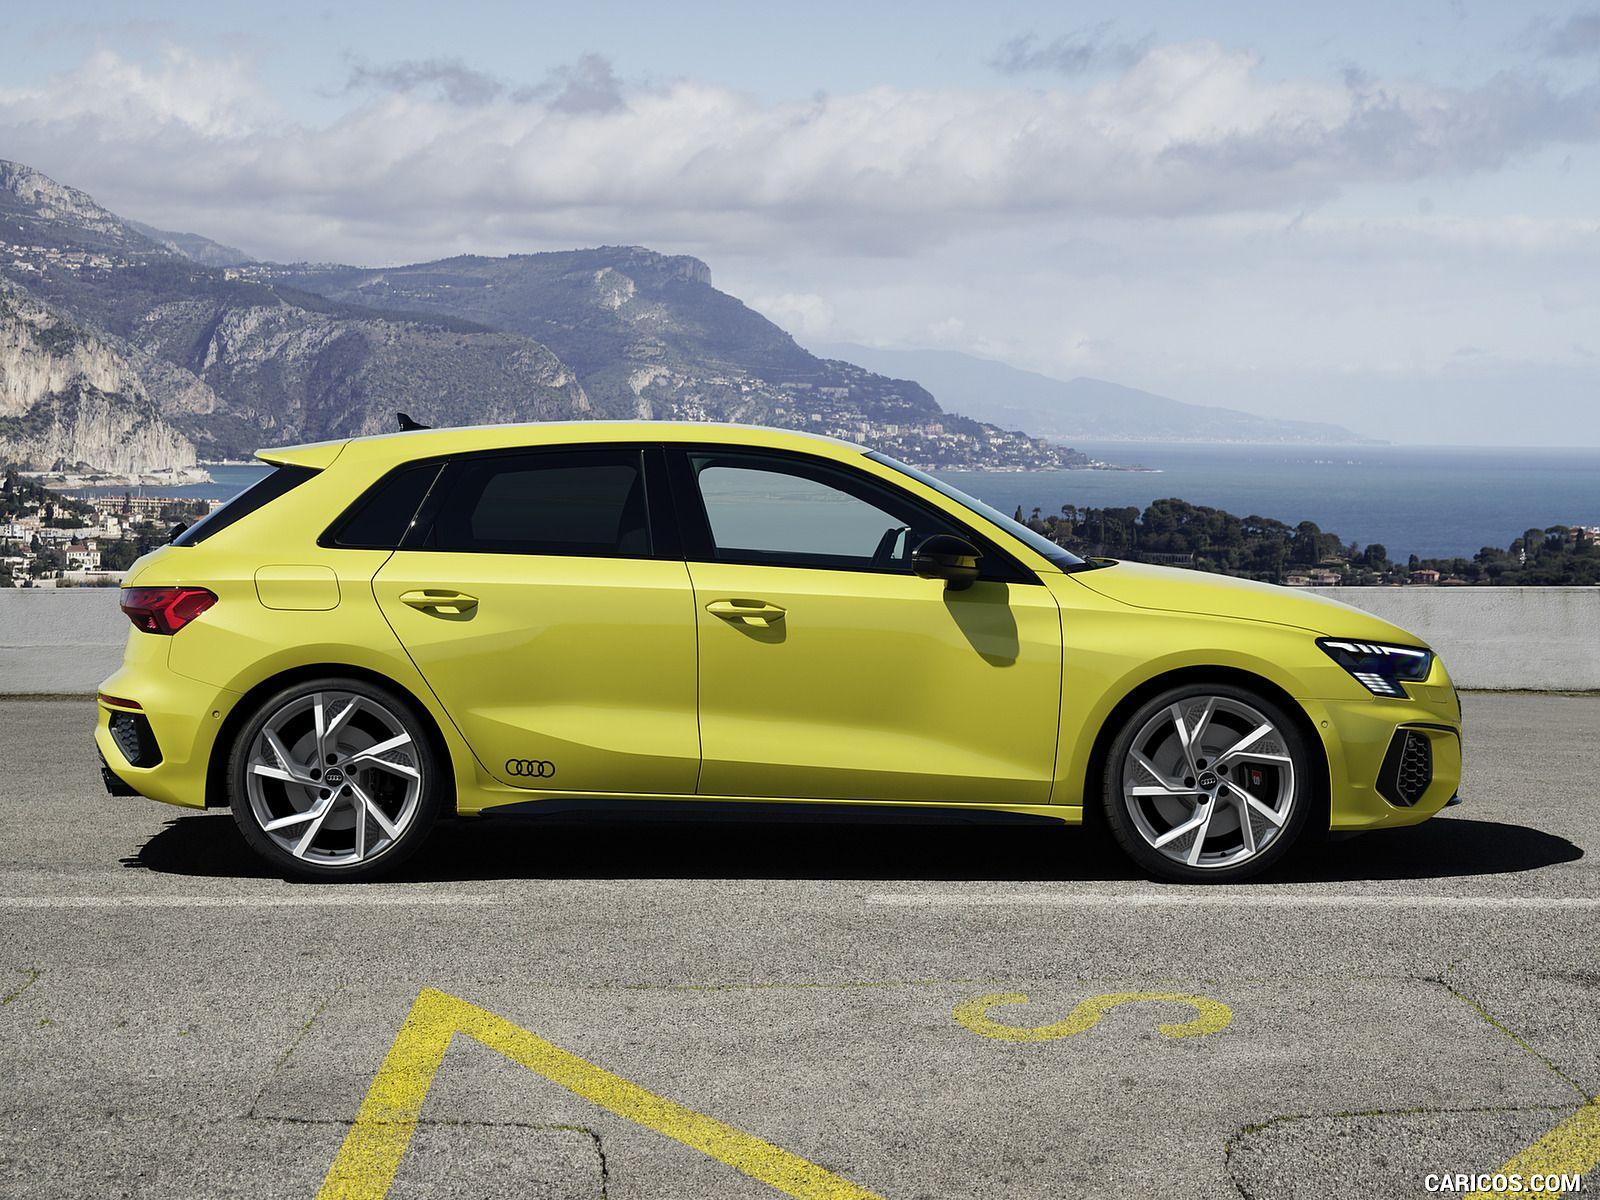 2021 Audi S3 Sportback Wallpaper Audi S3 Sportback Audi 2020 Audi